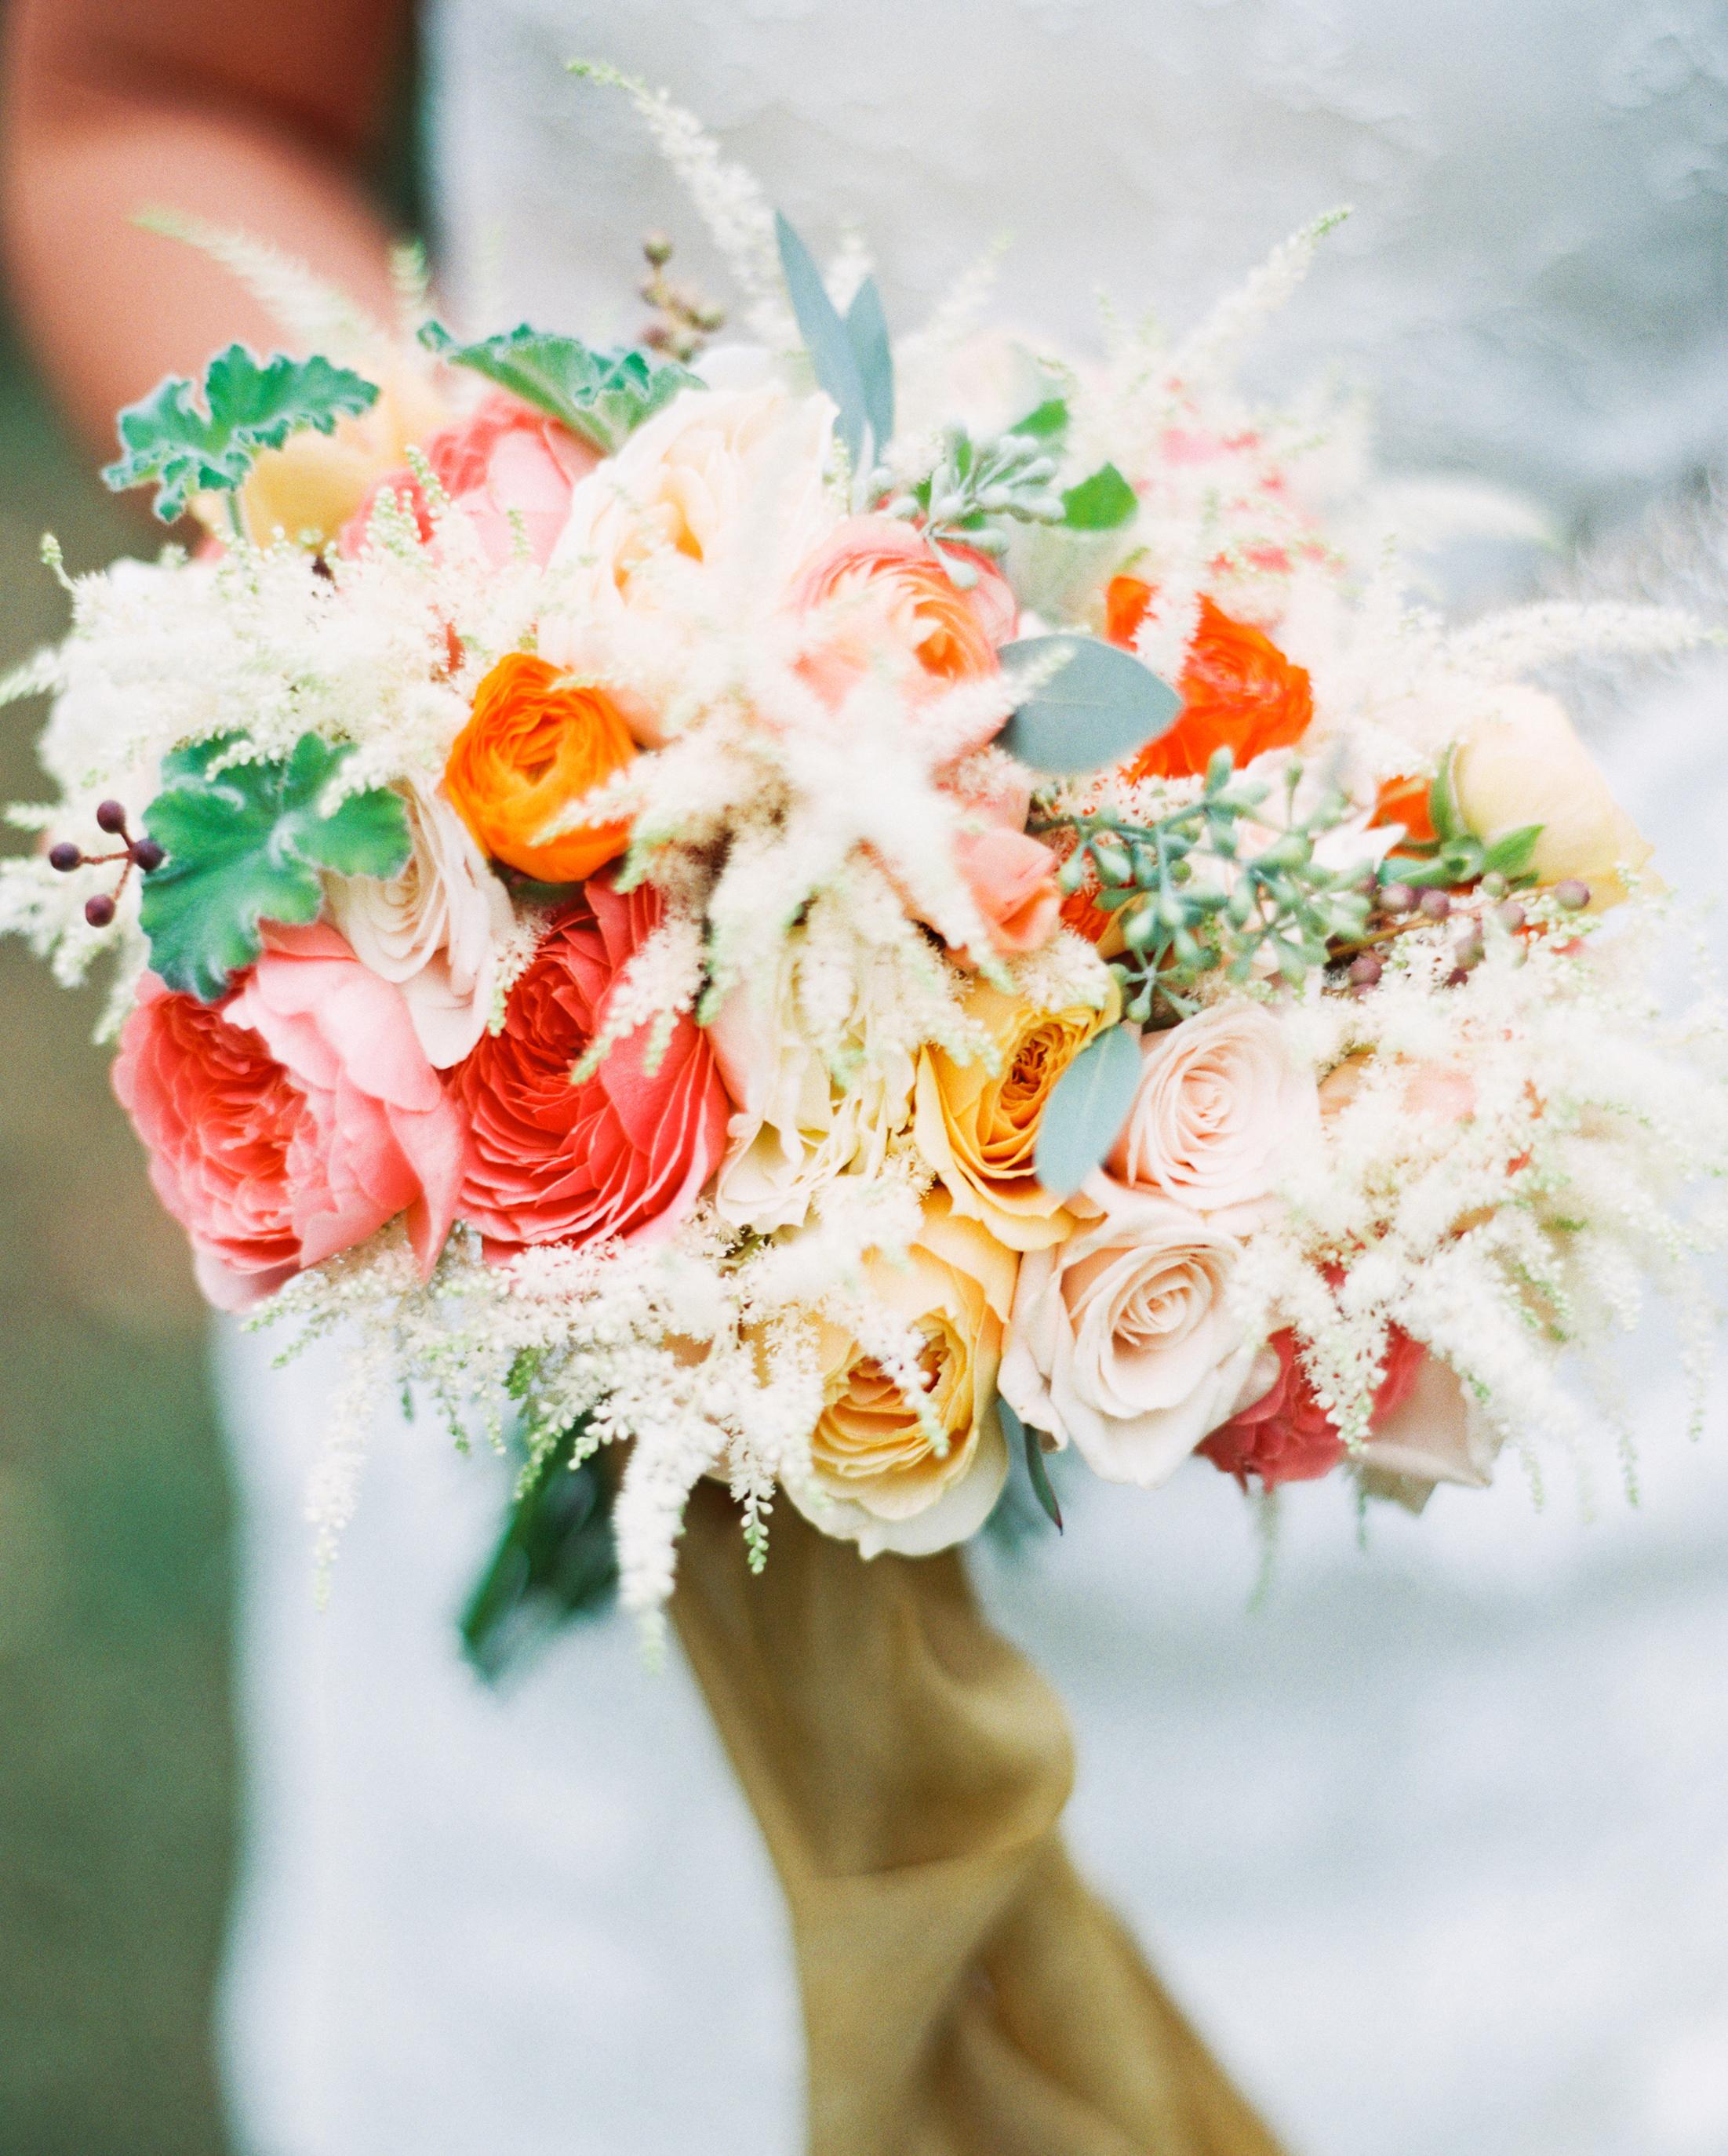 brittany-andrew-wedding-bouquet-031-s112067-0715.jpg